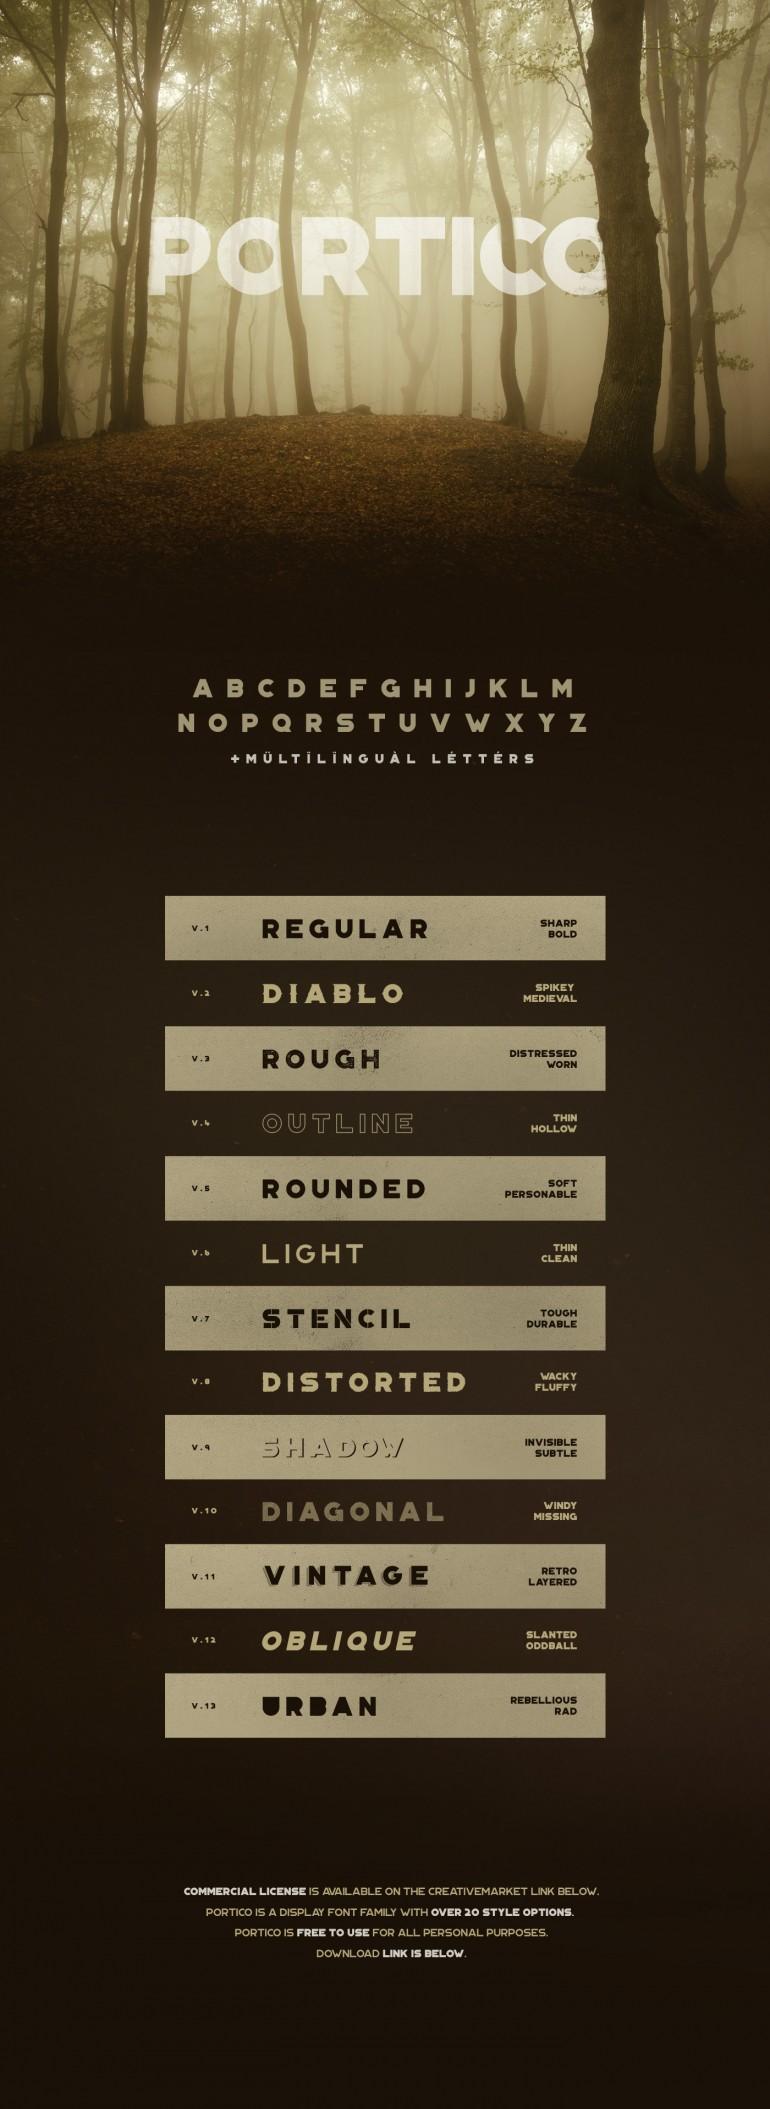 Portico Typeface